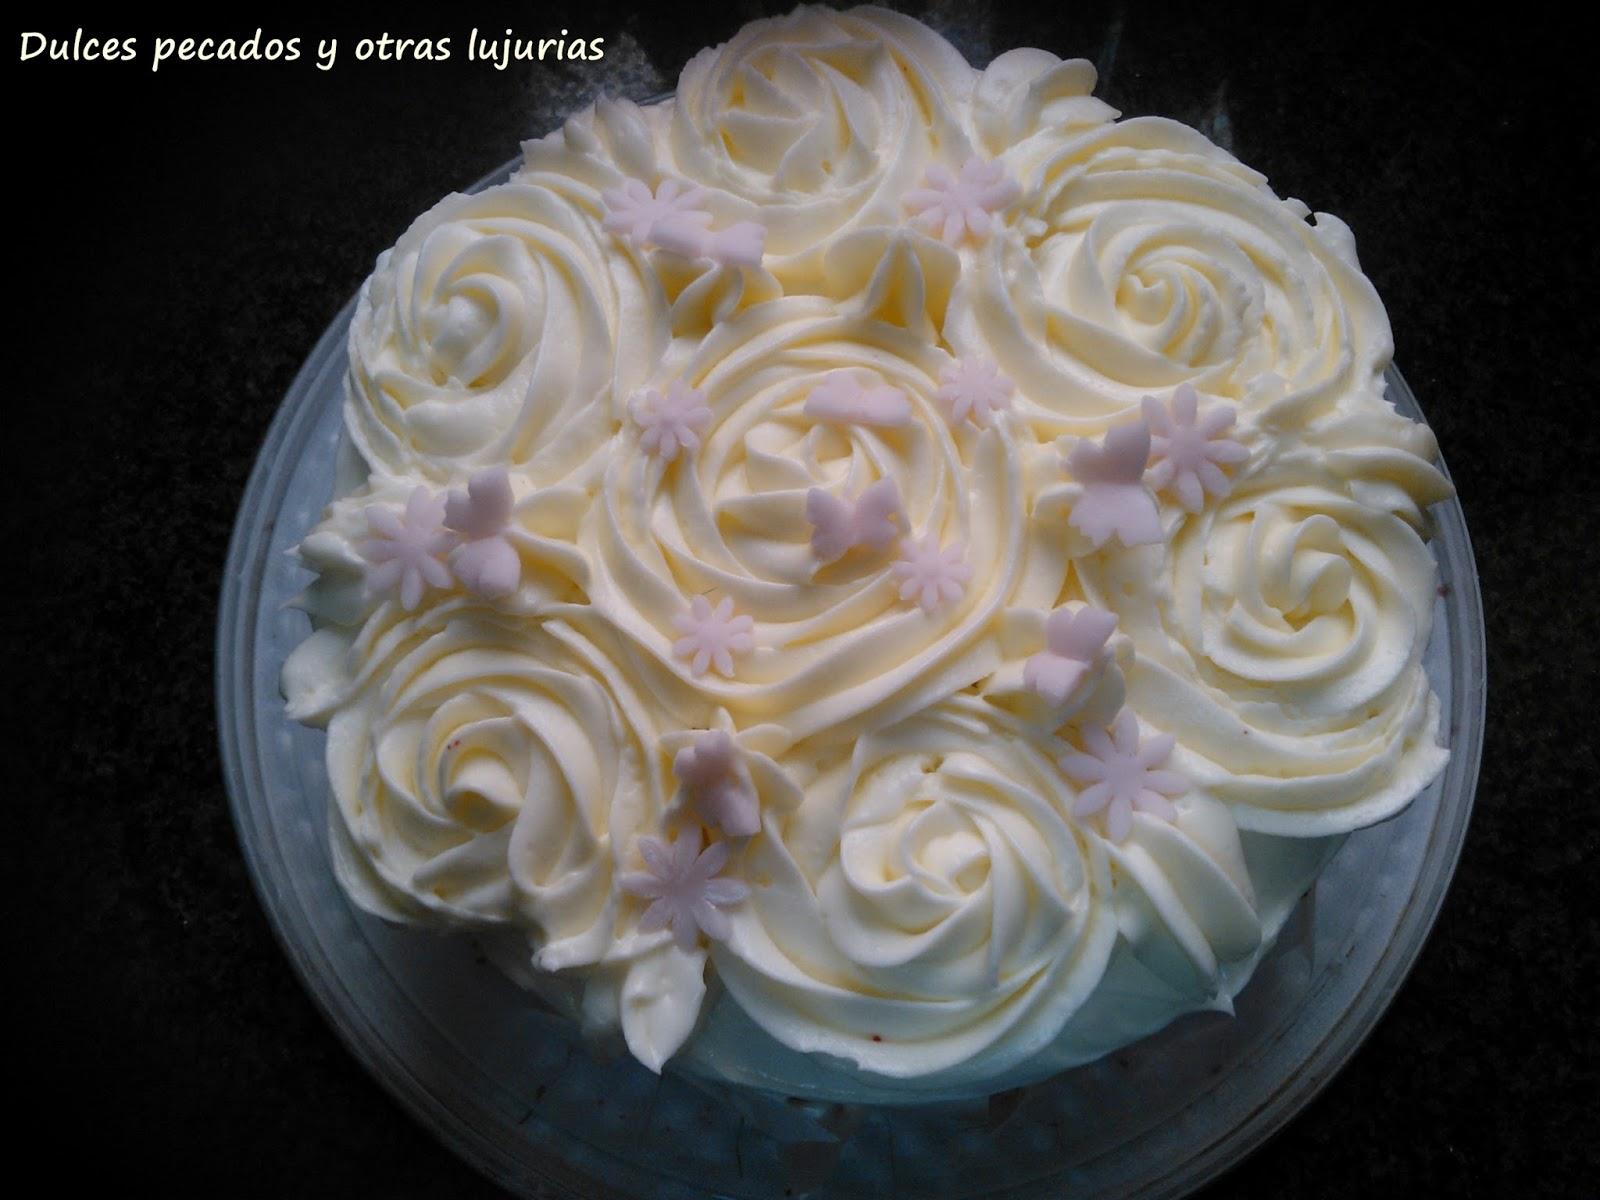 Dulces pecados y otras lujurias tarta red velvet por - Tarta red velvet alma obregon ...